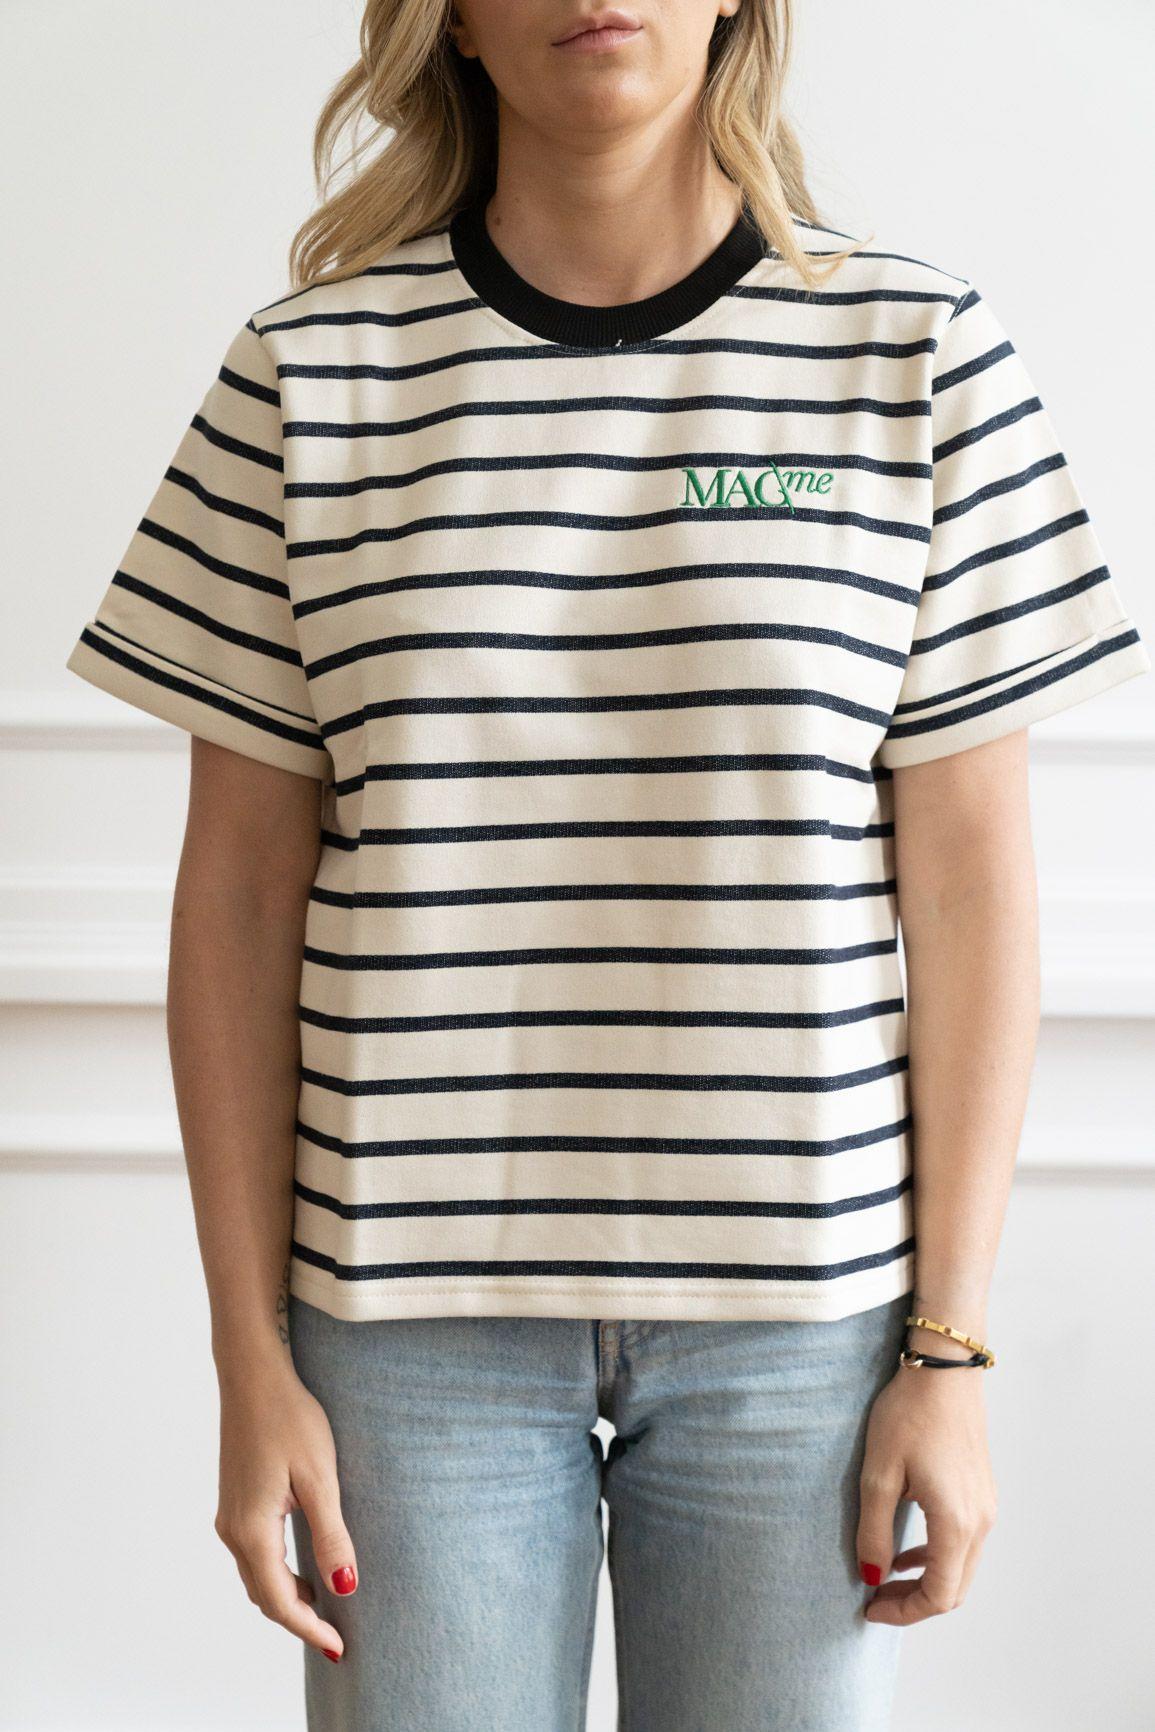 MagMe majica